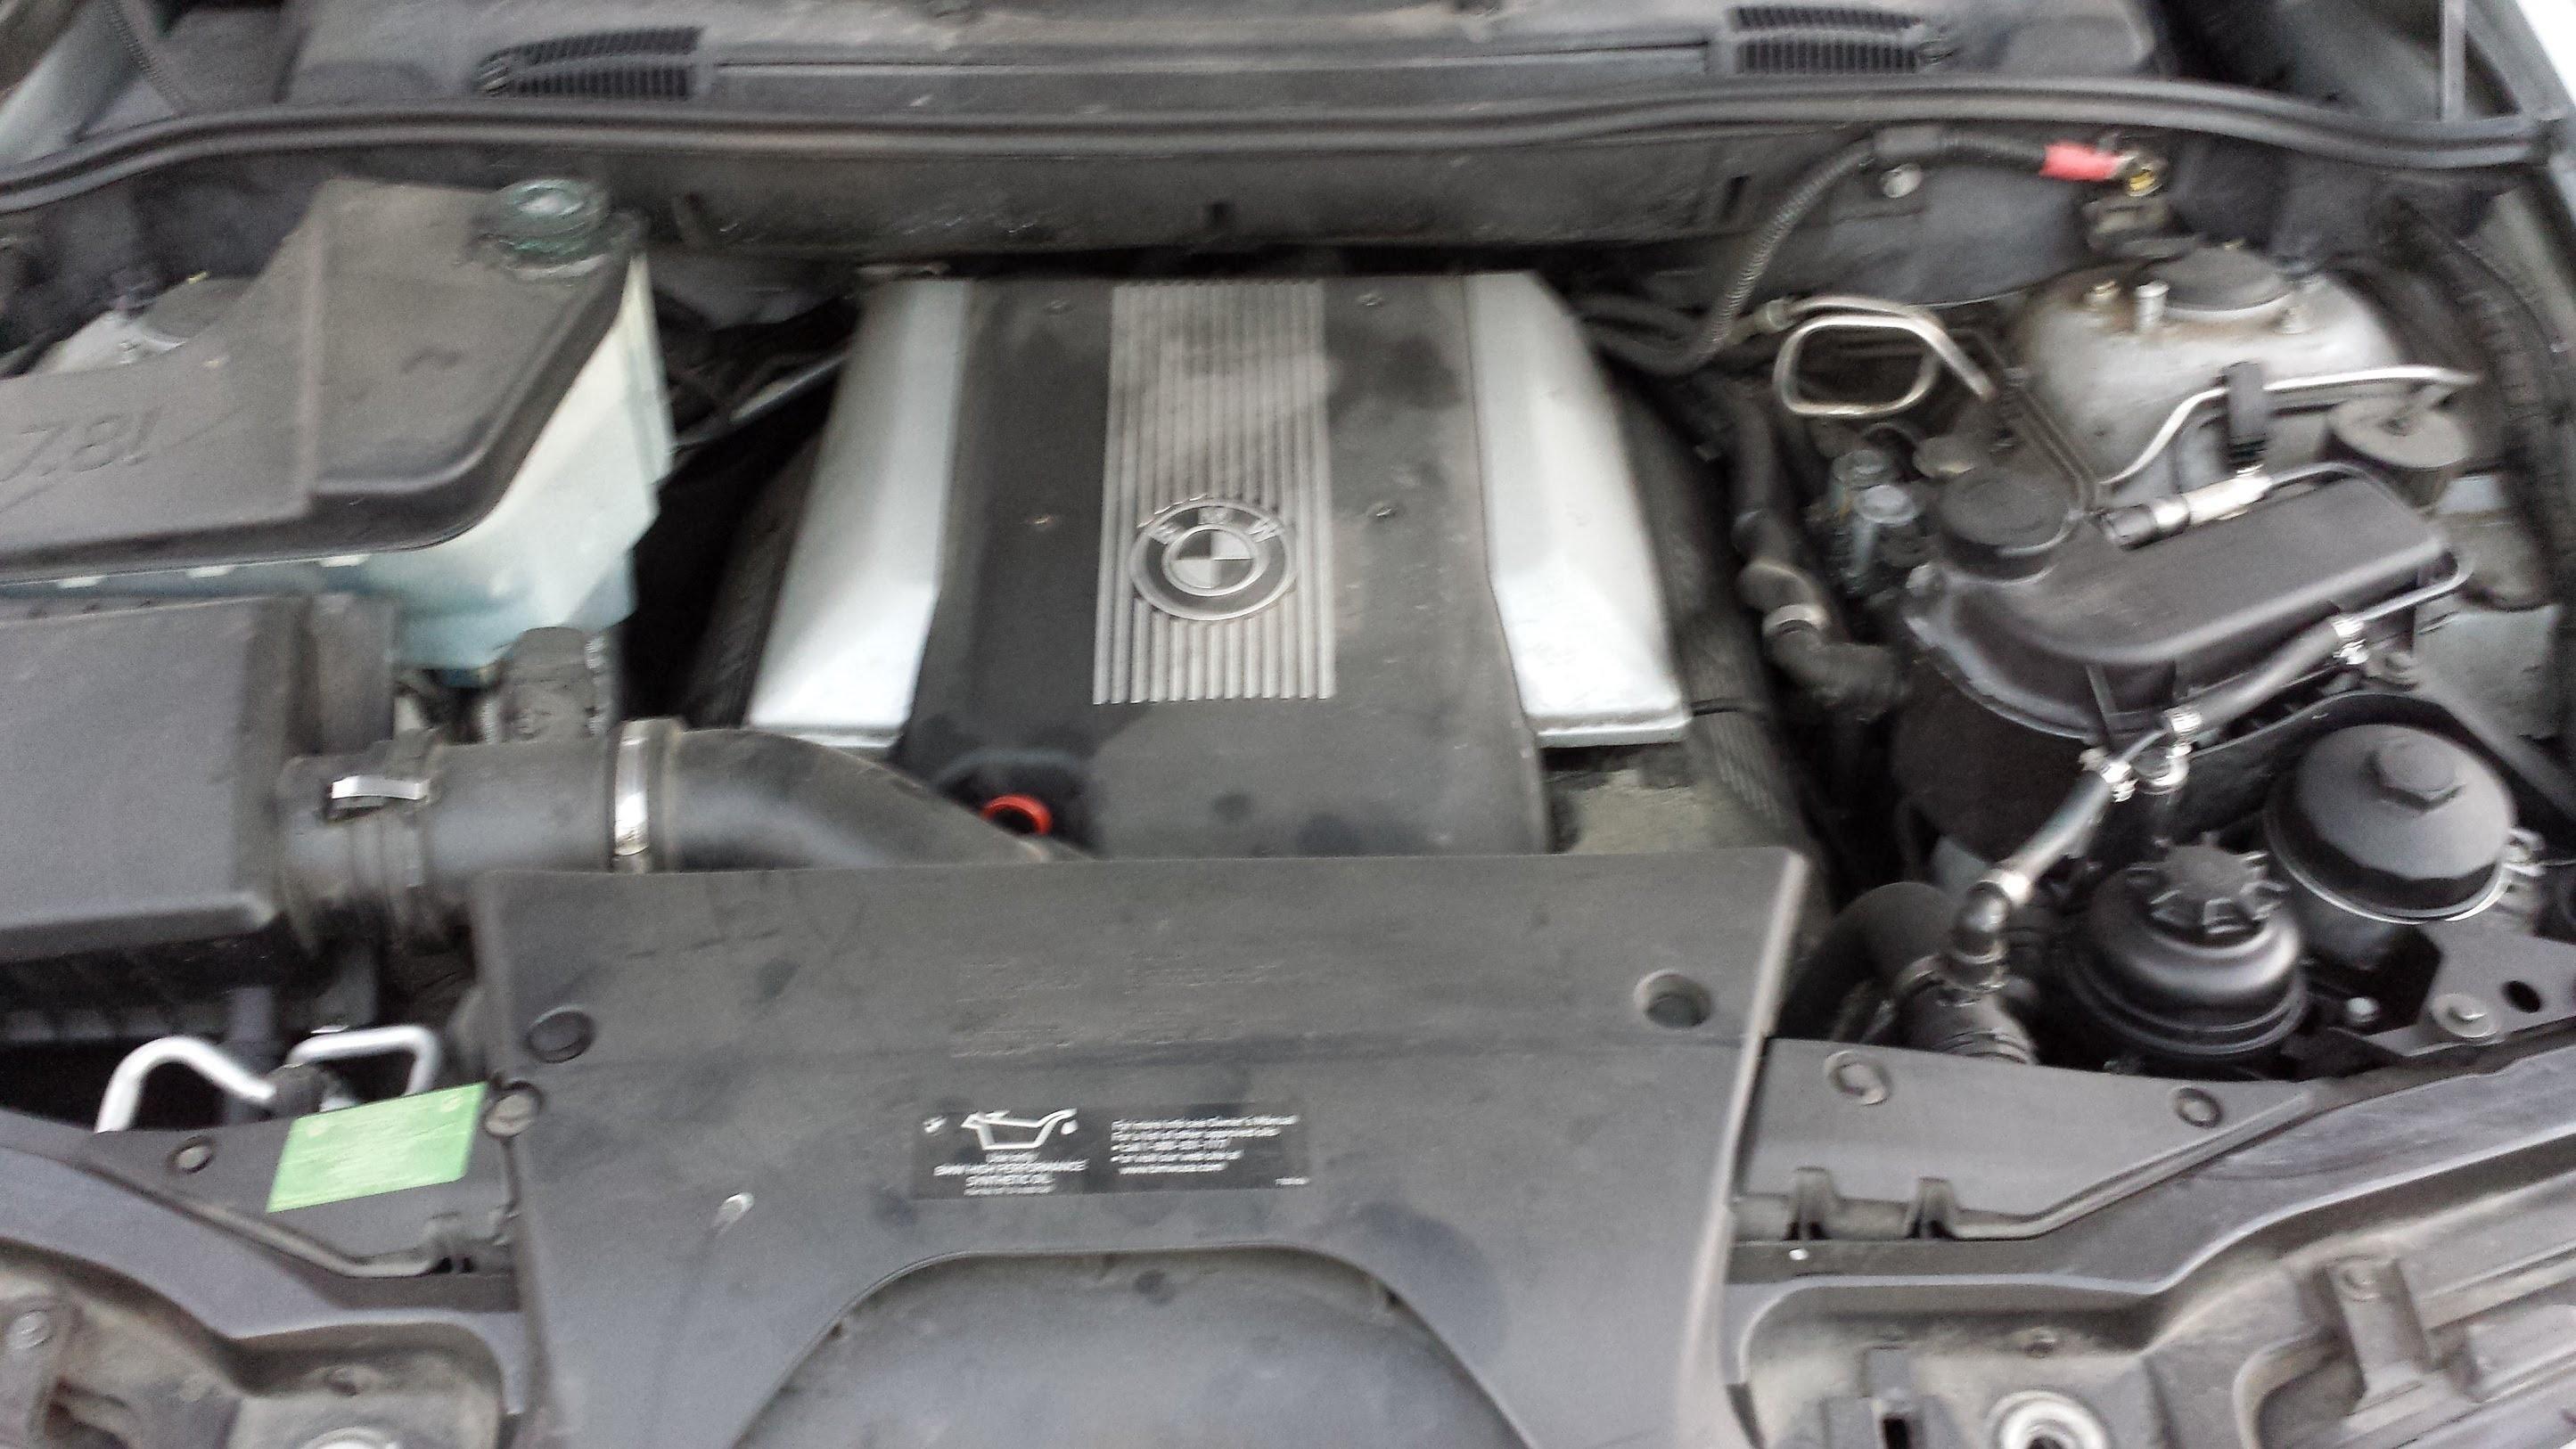 Car Motor Diagram Evo X Mitsubishi Lancer Evolution Engine Bmw E53 X5 4 Vanos Of